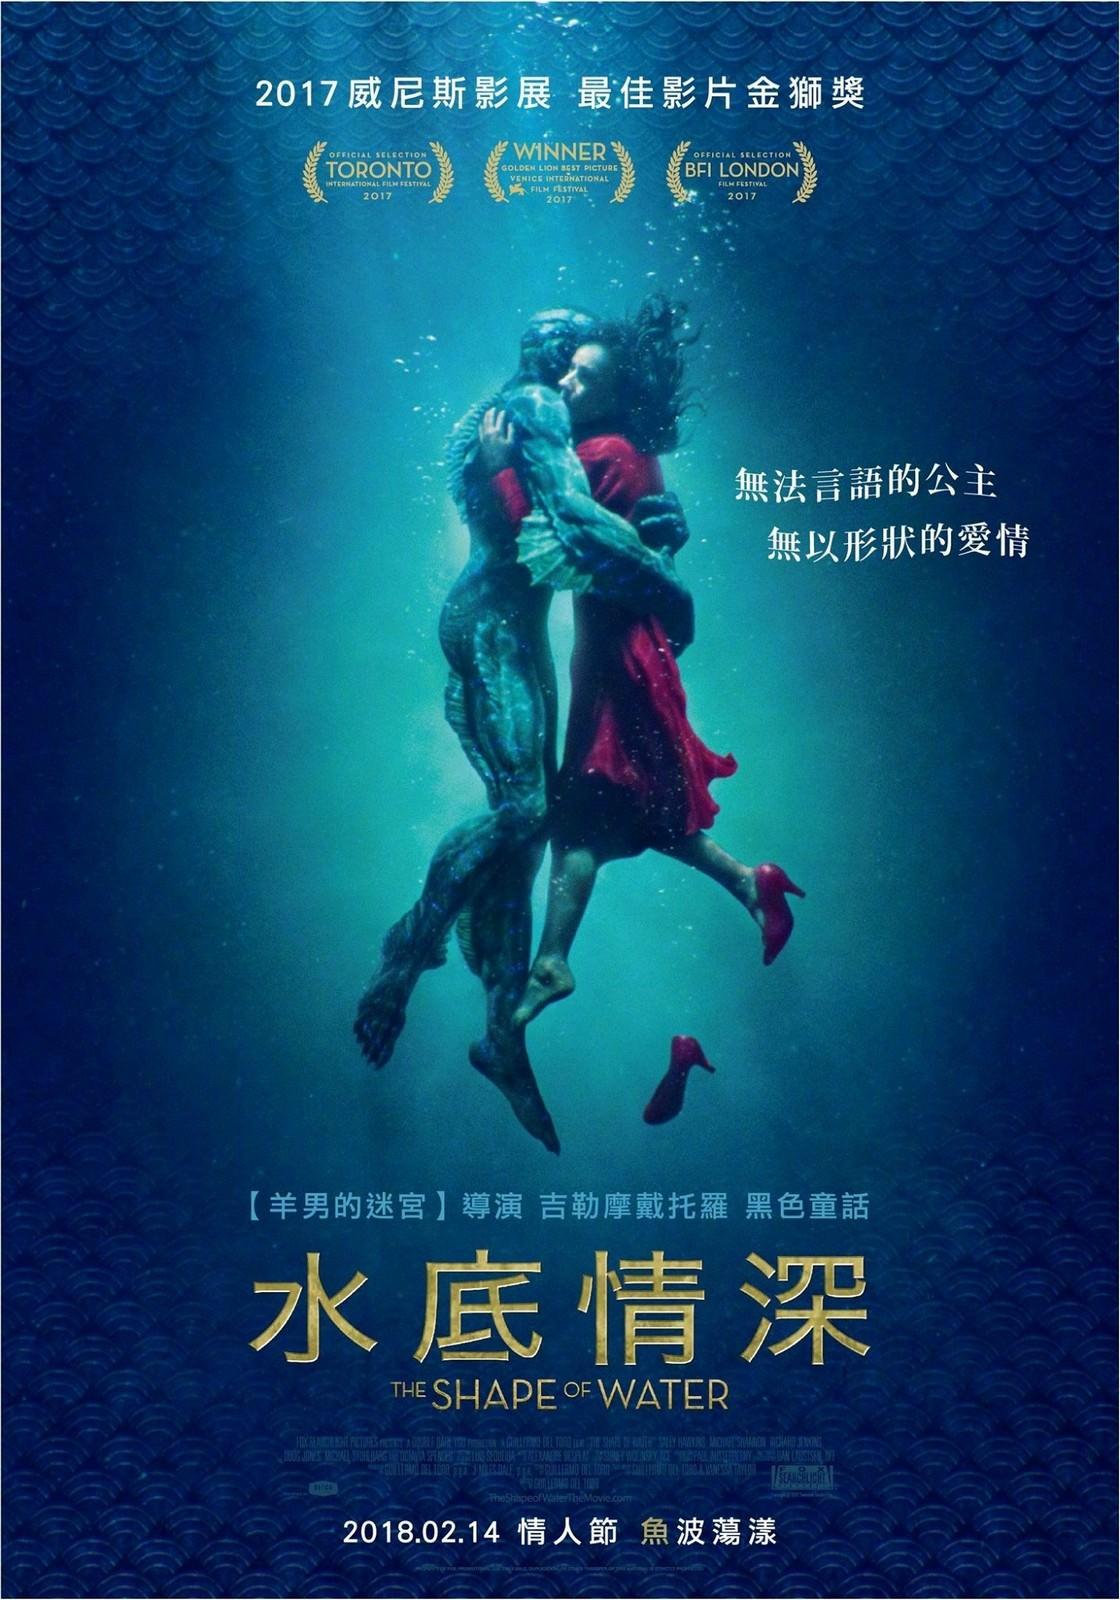 Movie, The Shape of Water(美國, 2017) / 水底情深(台灣) / 忘形水(香港) / 水形物语(網路), 電影海報, 台灣